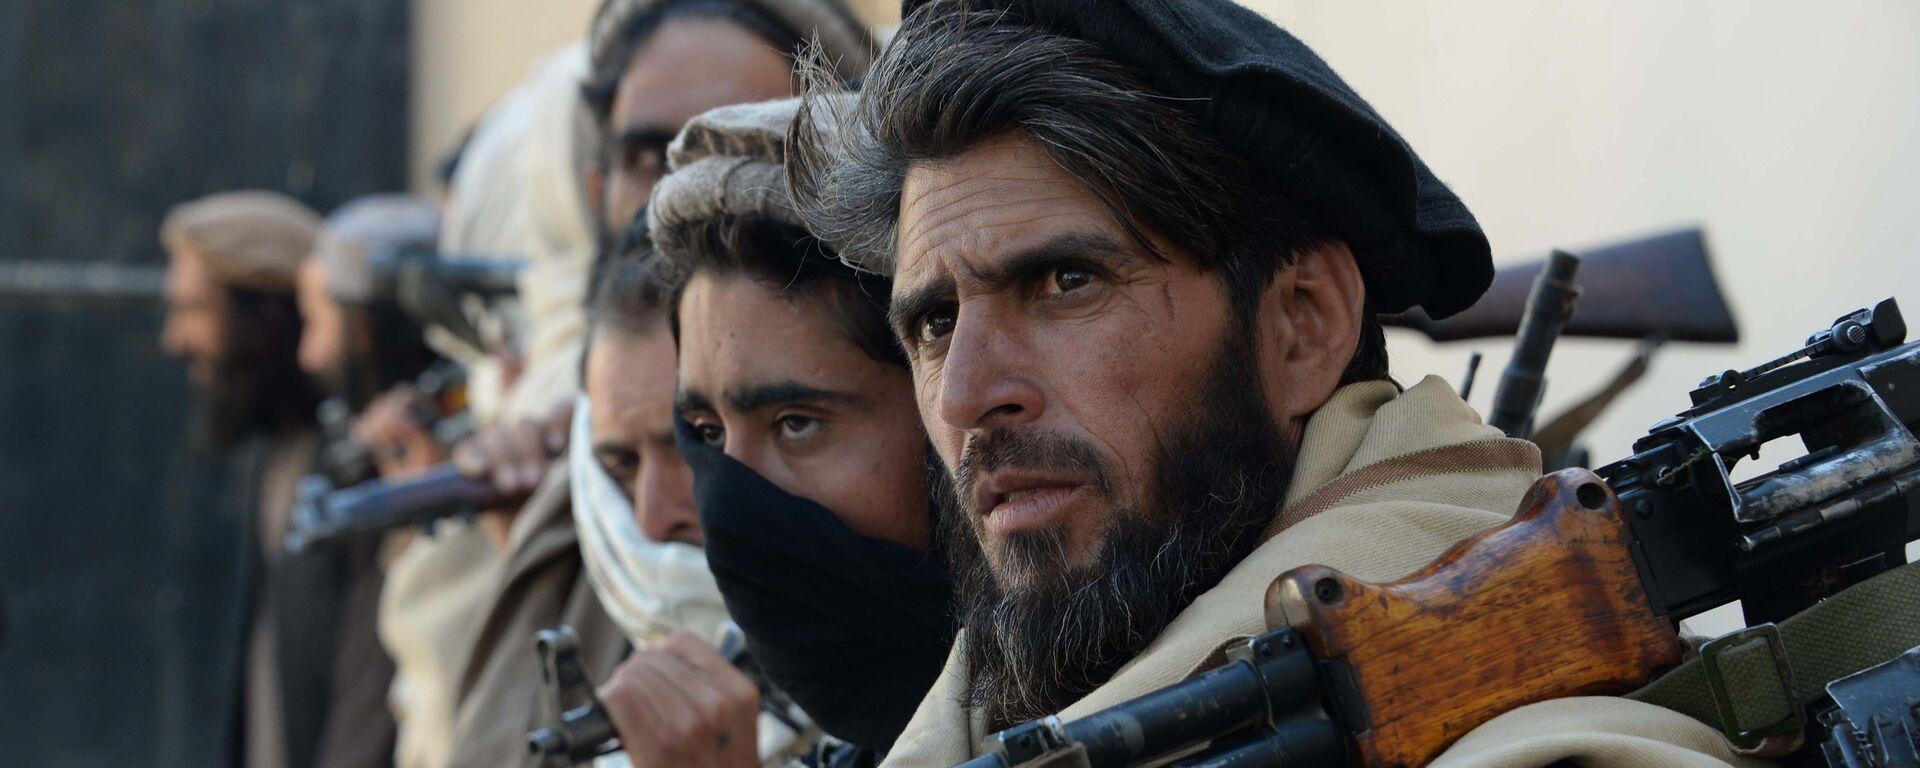 Члены движения Талибан (запрещено в РФ), Афганистан. Архивное фото - Sputnik Таджикистан, 1920, 25.06.2021